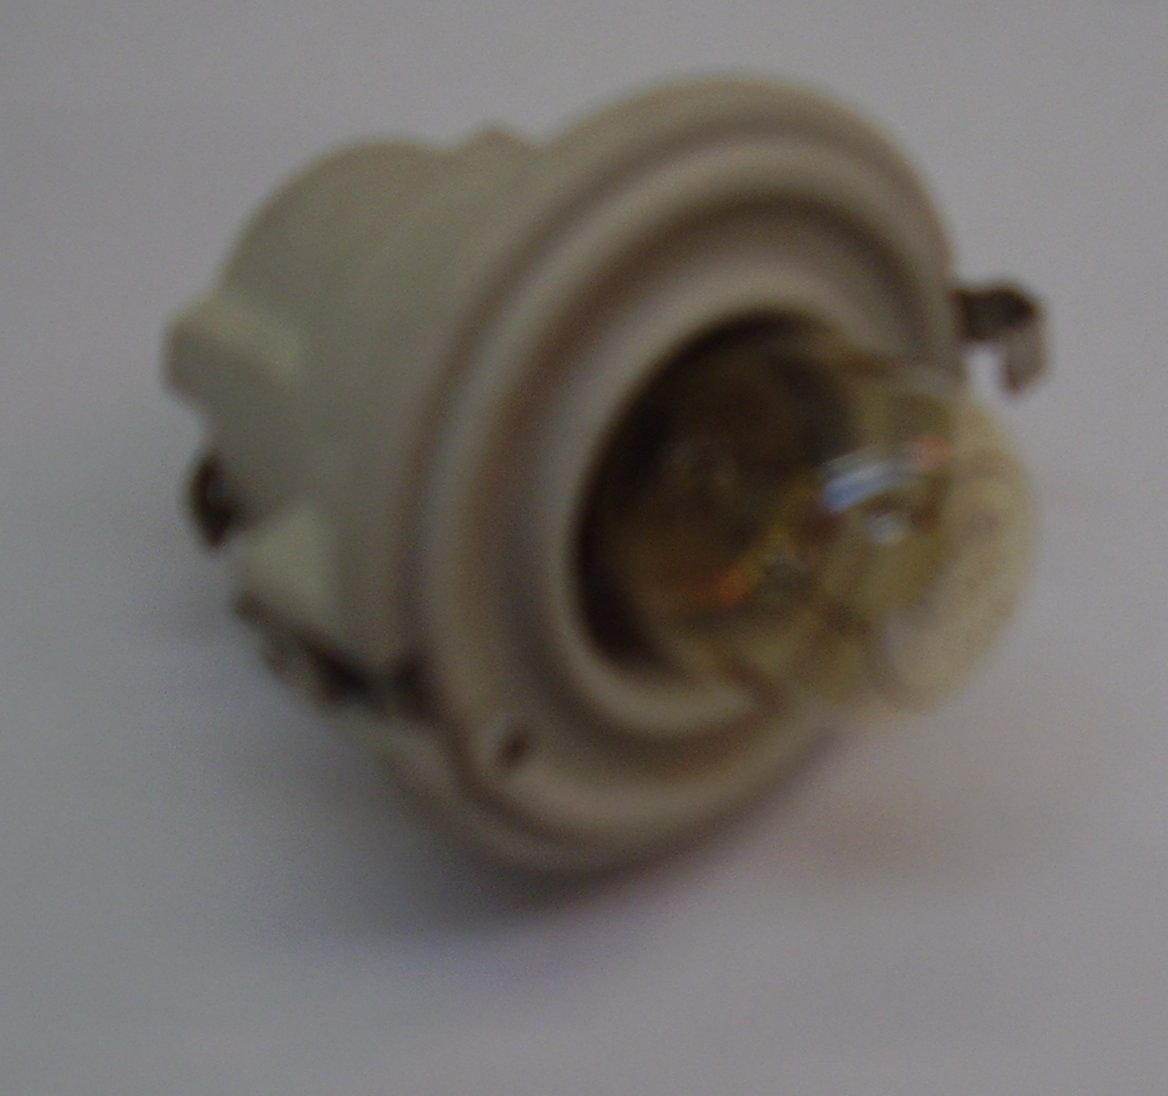 Description of LAMP ASSY